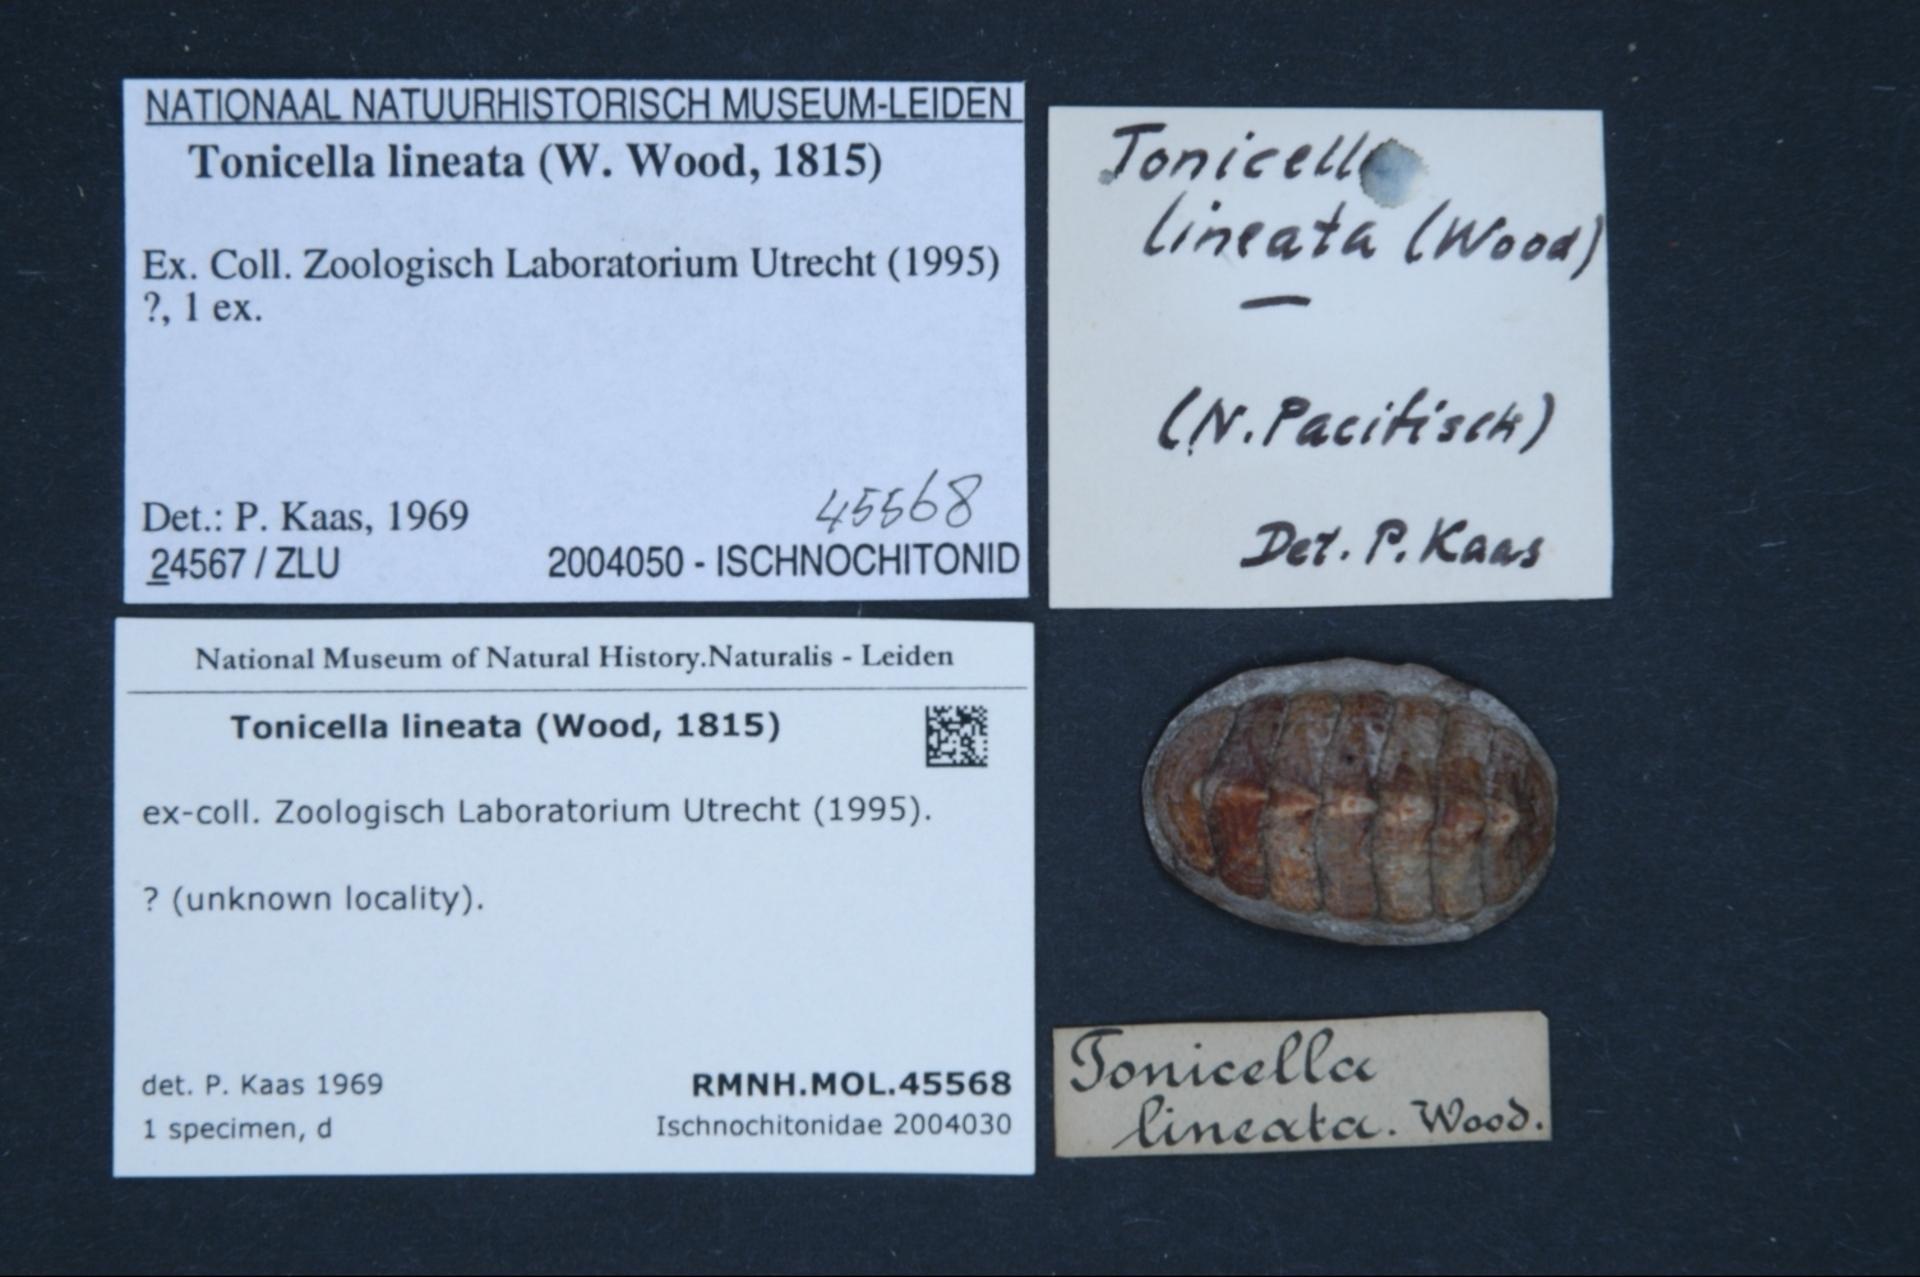 Naturalis_Biodiversity_Center_-_RMNH.MOL.45568_-_Tonicella_lineata_%28Wood%2C_1815%29_-_Ischnochitonidae_-_Mollusc_shell.jpeg